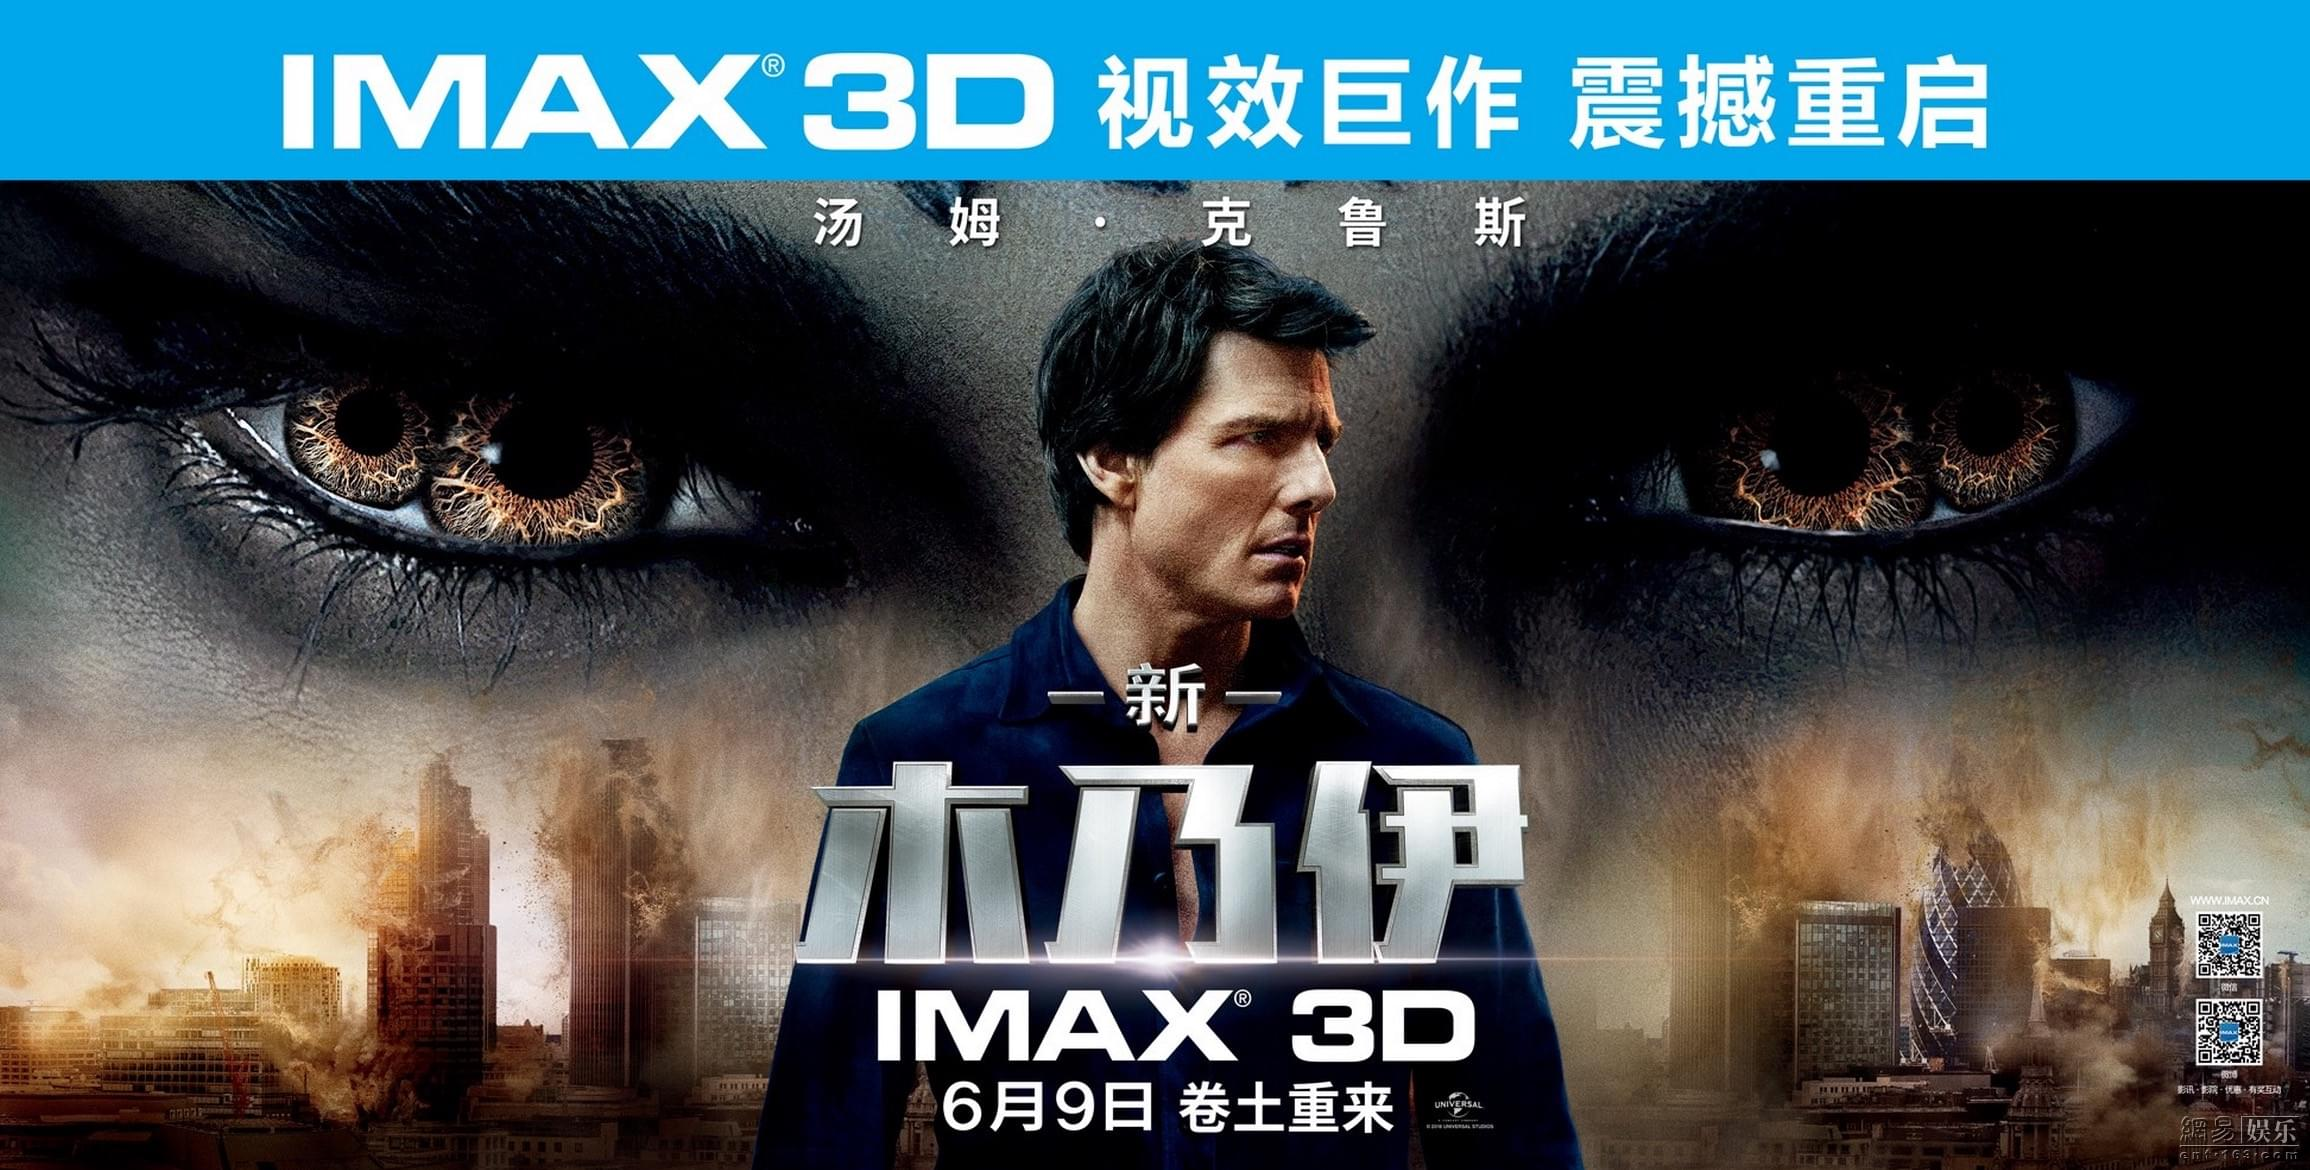 IMAX举办《新木乃伊》观影会 阿汤哥玩命肉搏